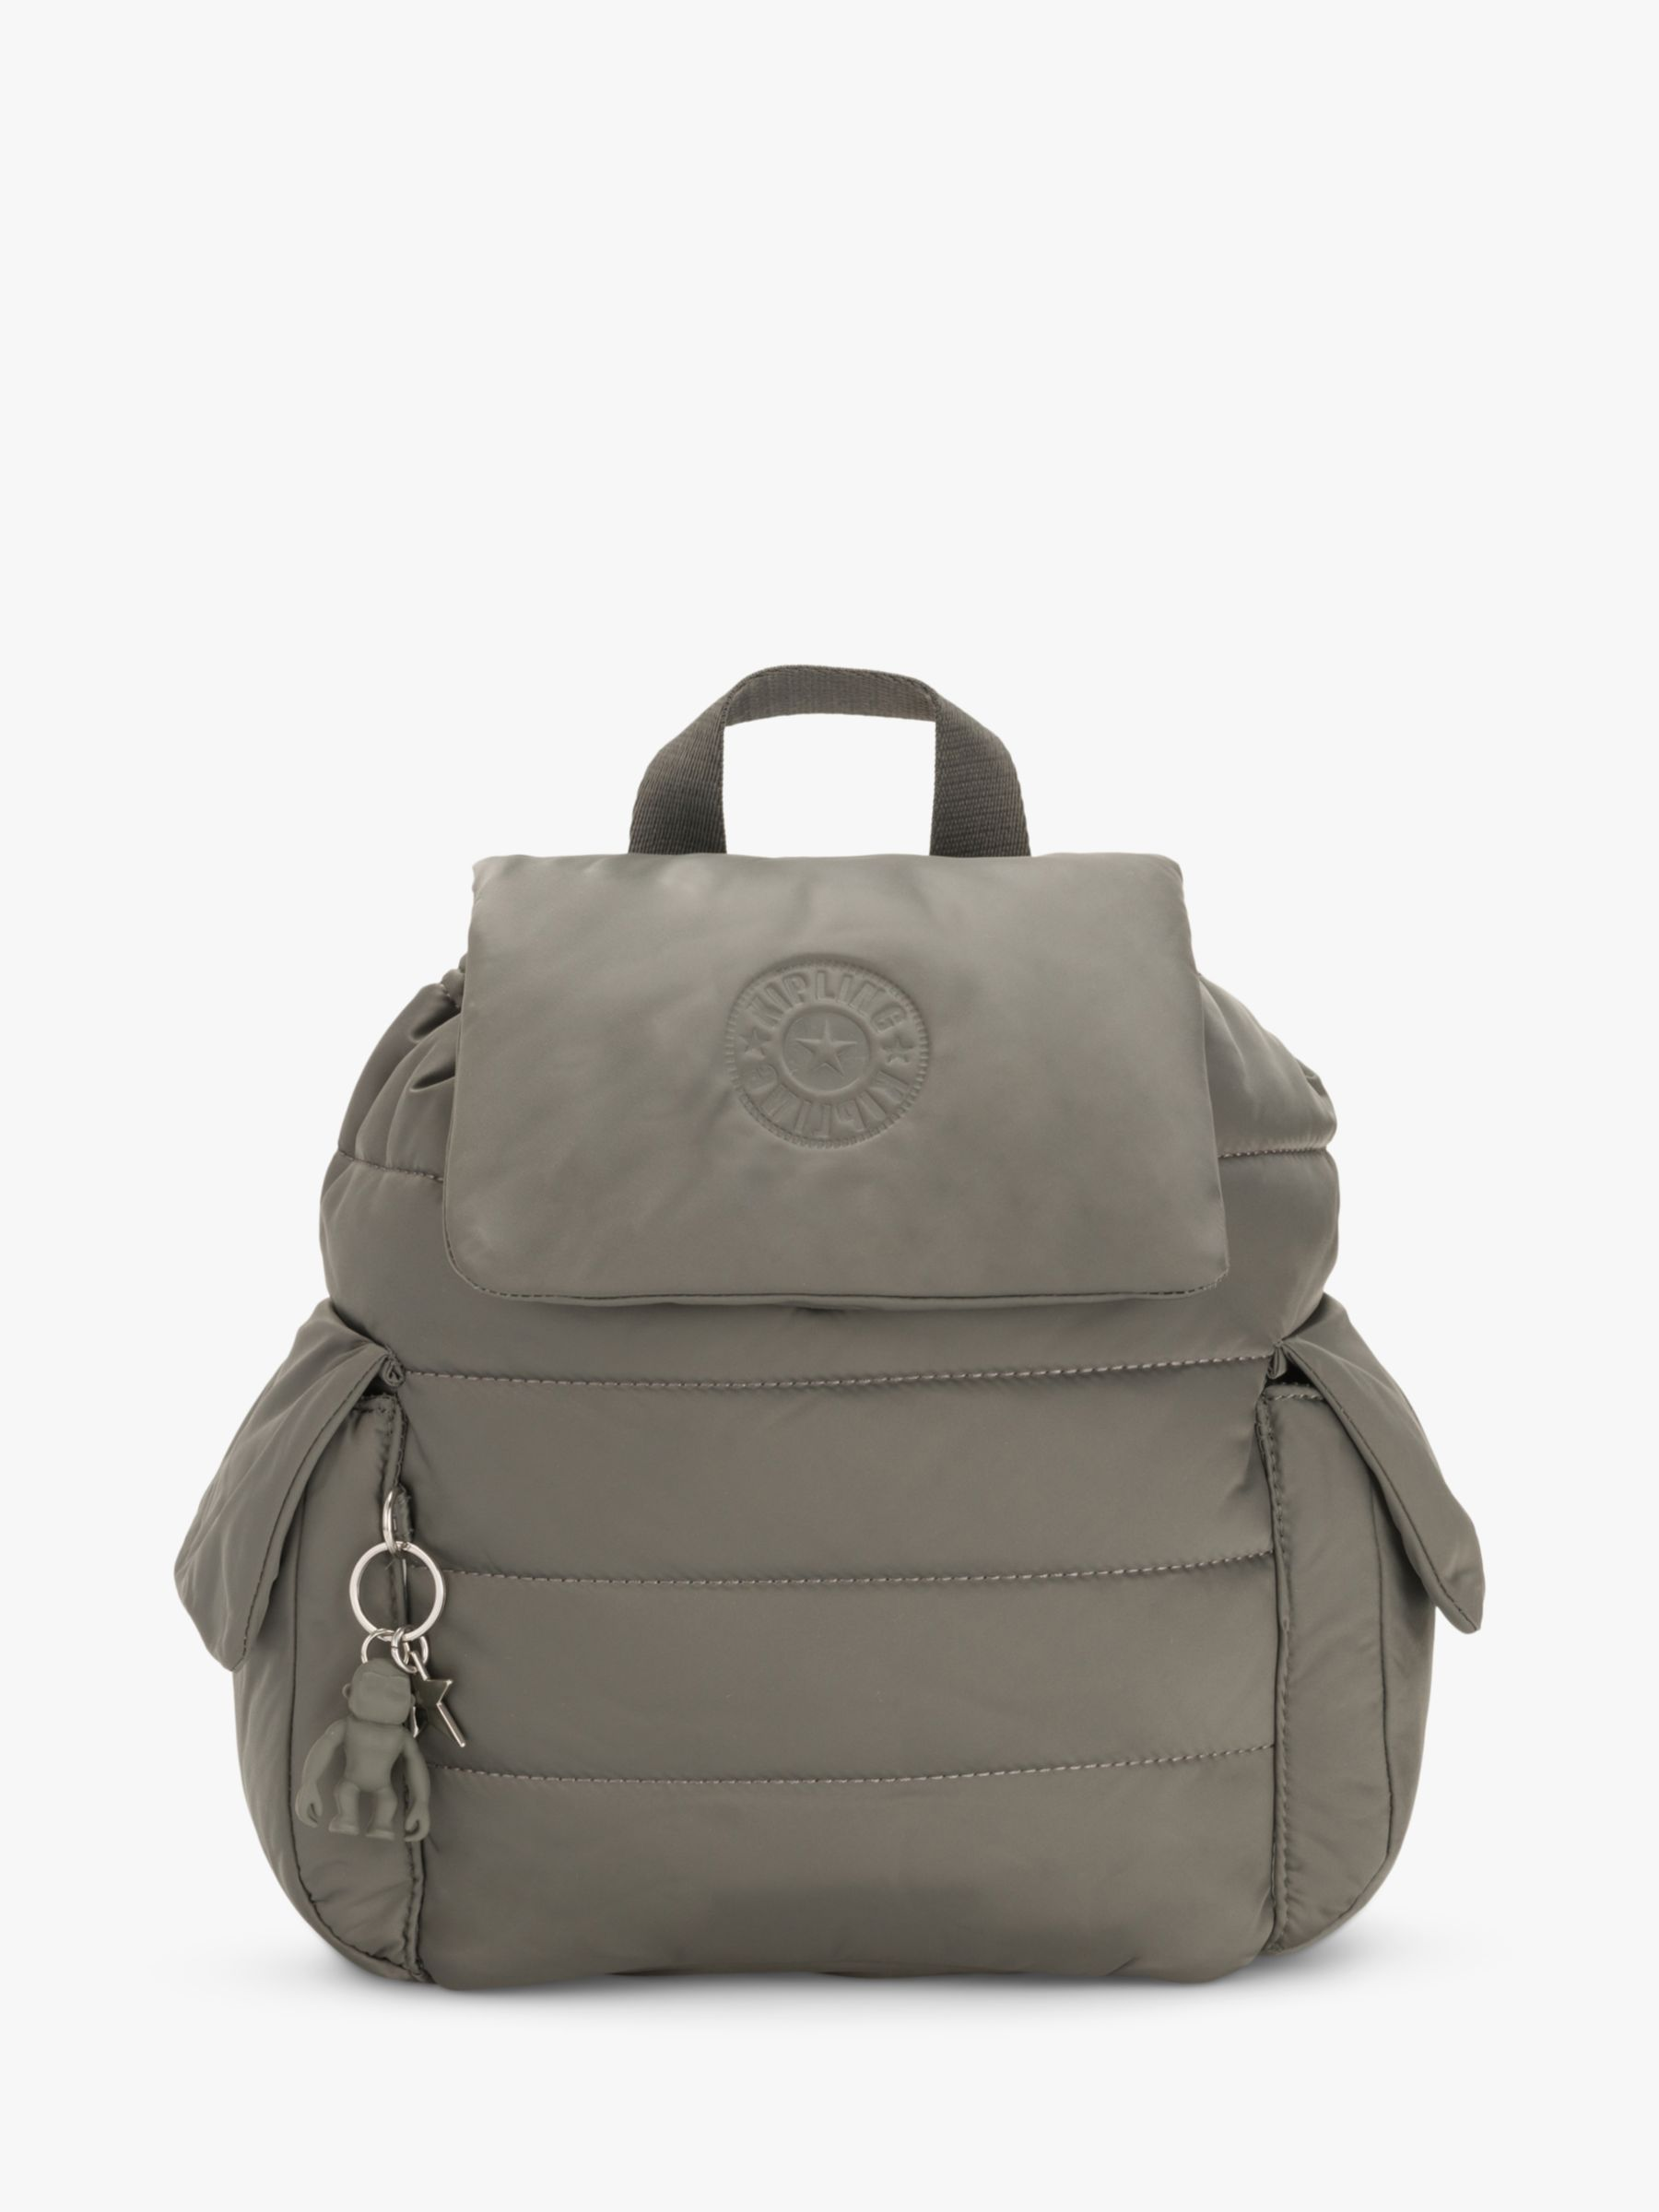 Kipling Kipling Manito Puff Backpack, Mountain Grey